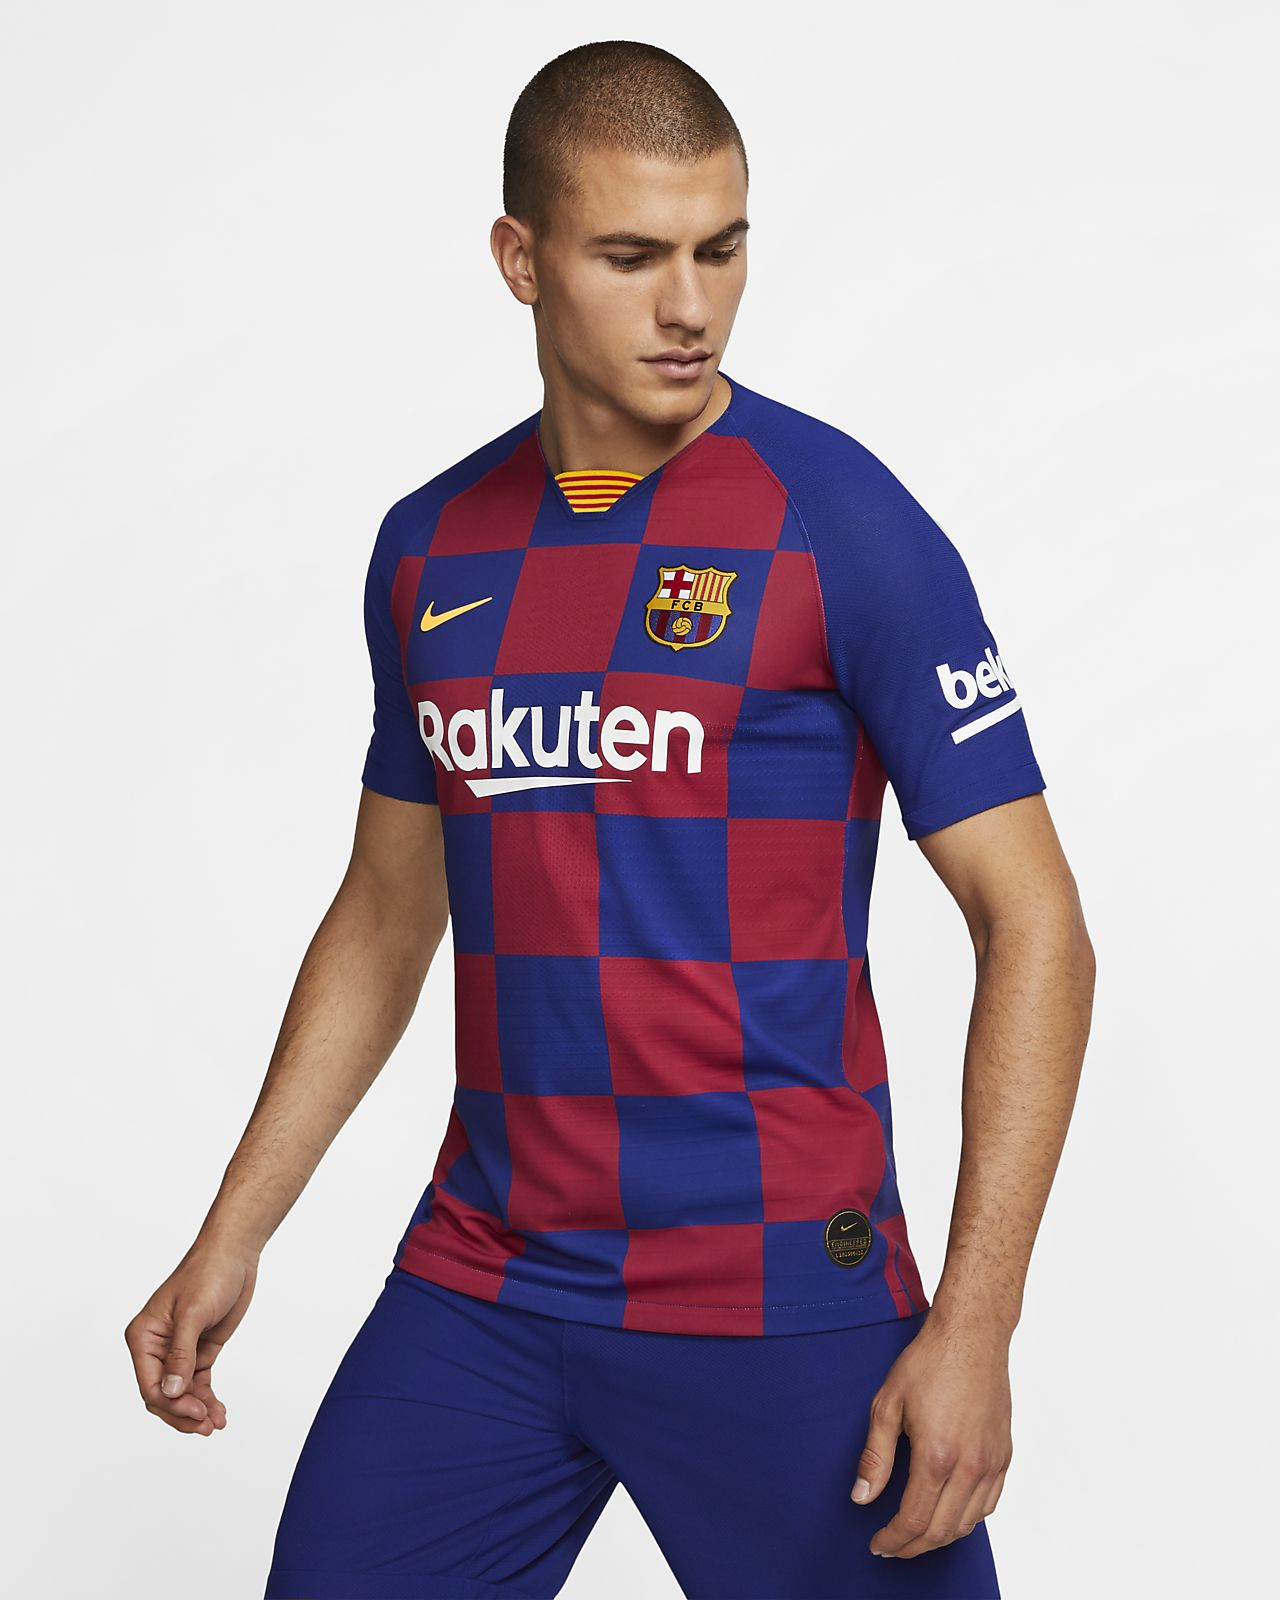 ea08193c ... Camiseta de fútbol para hombrede local Vapor Match del FC Barcelona 2019 /20